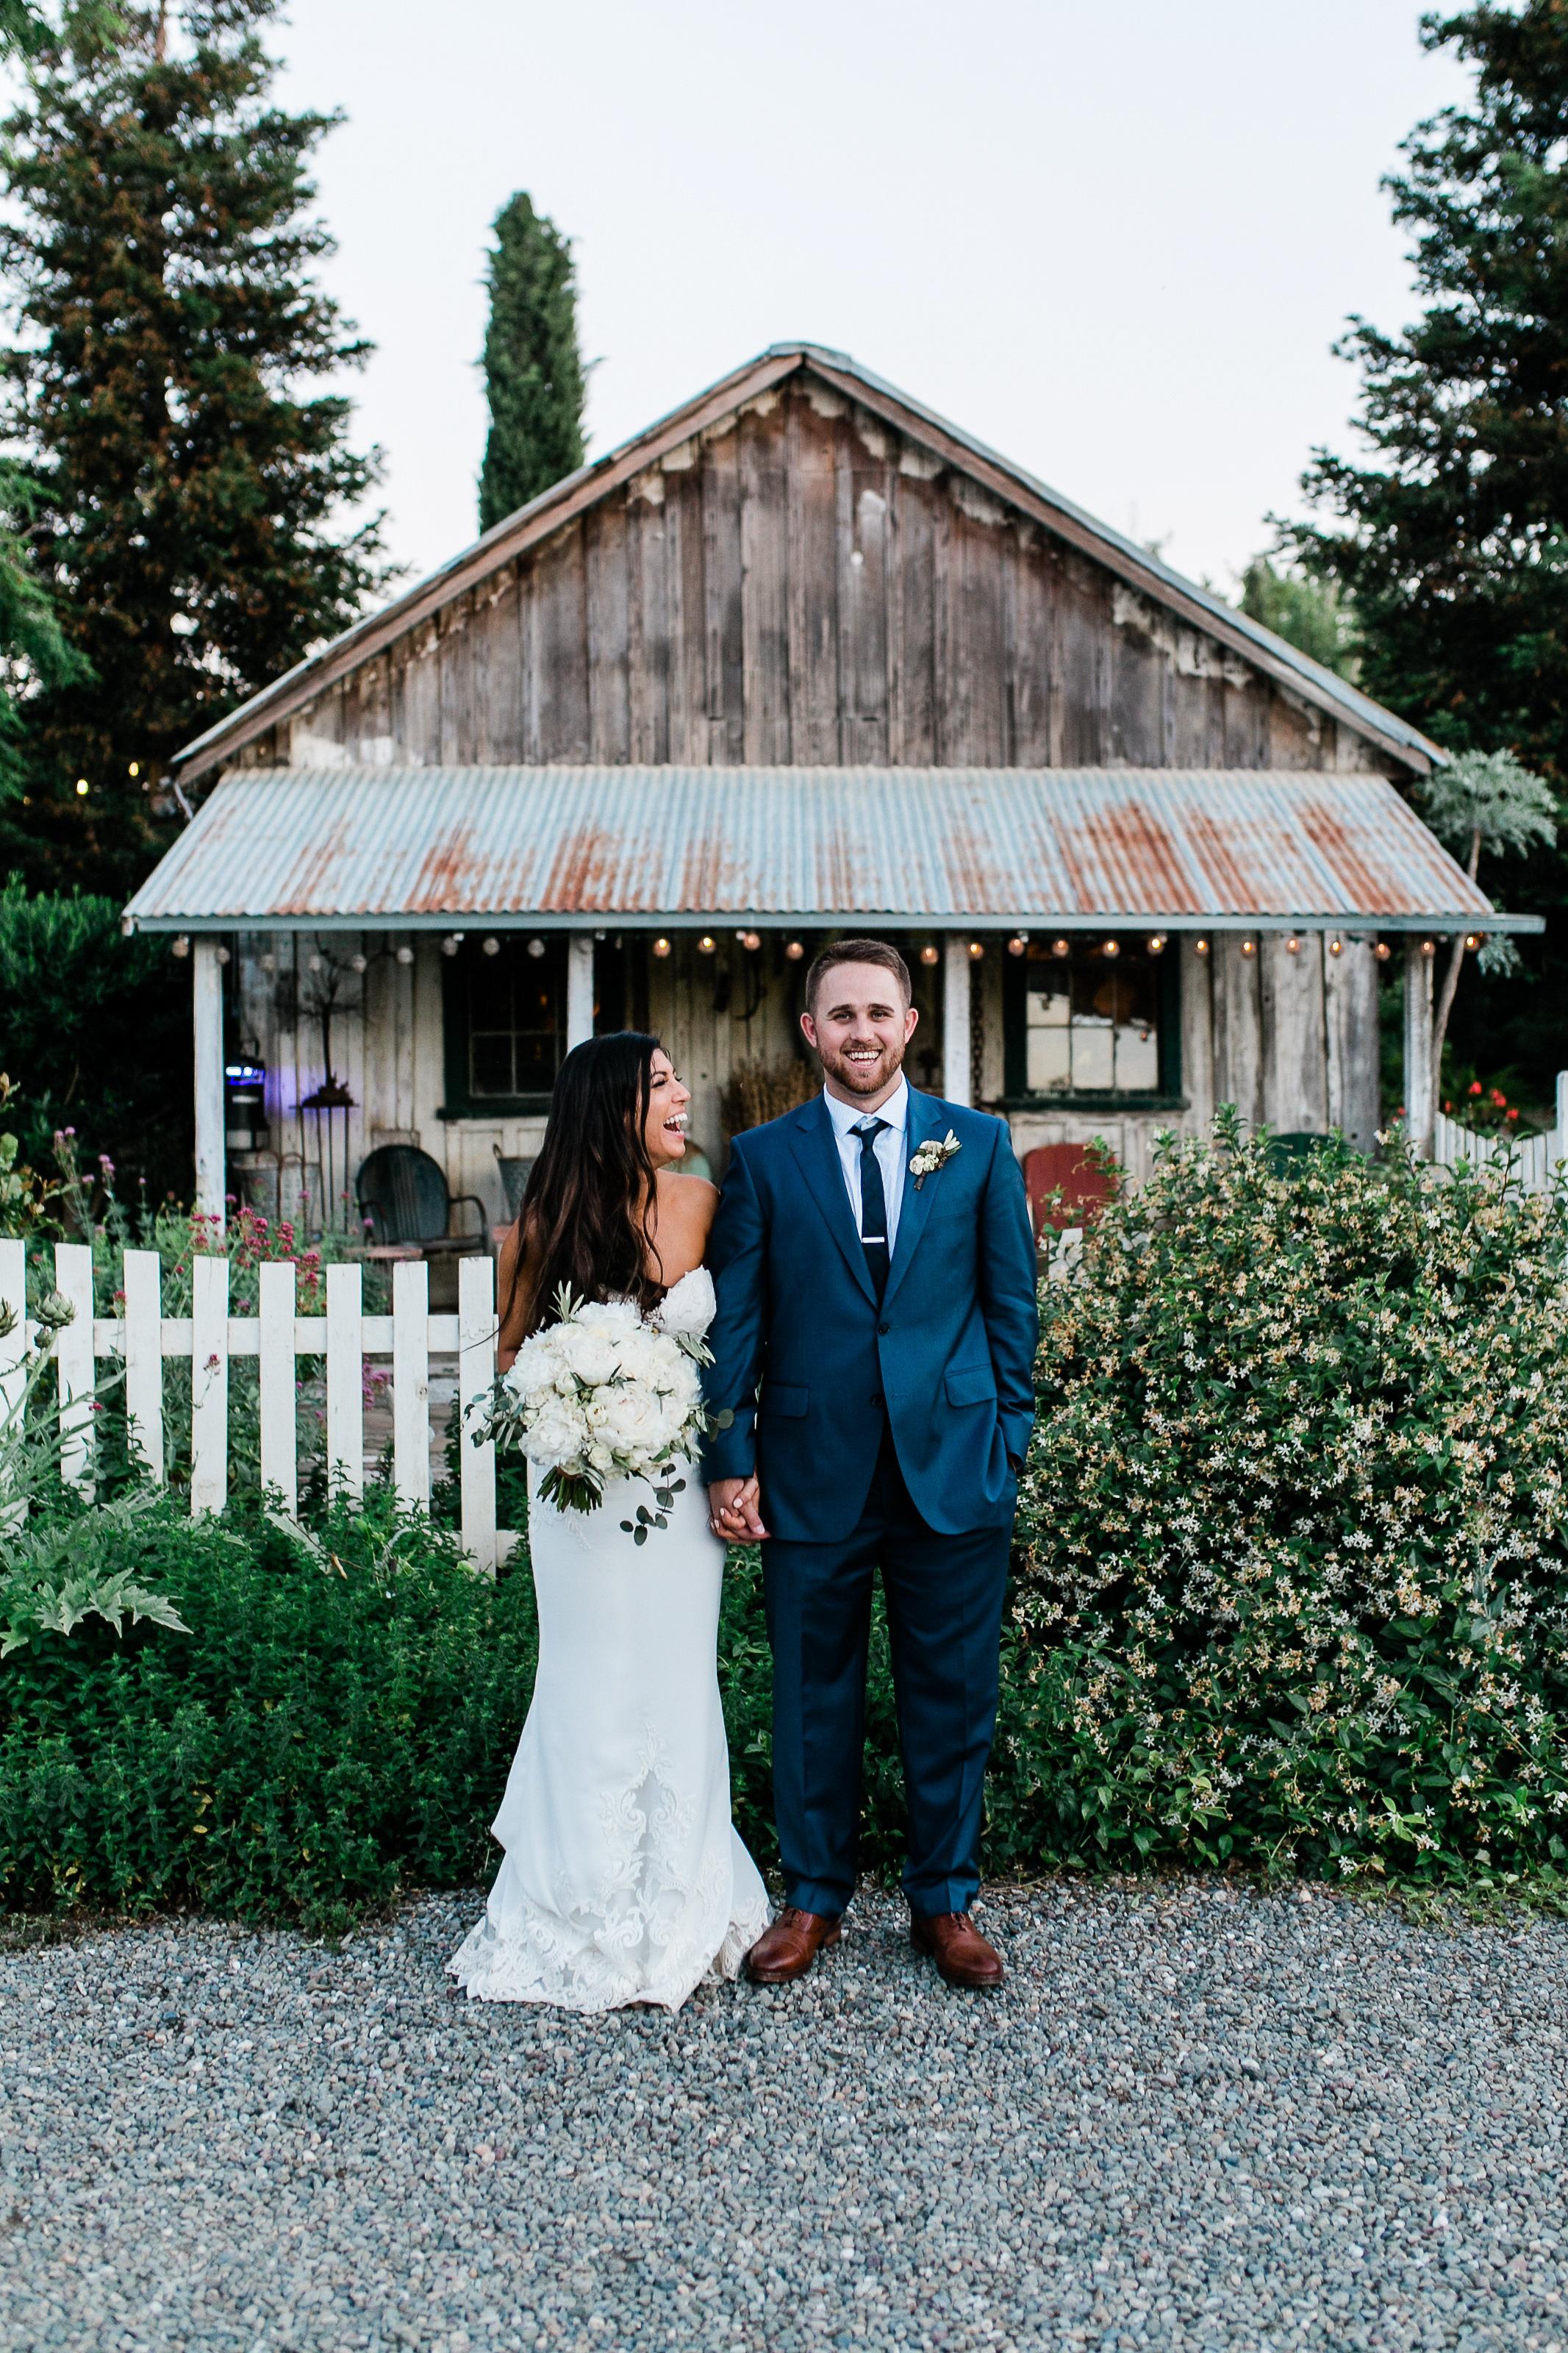 Park Winters Summer Wedding | Bride and Groom Photo | Country Wedding | Vintage Wedding